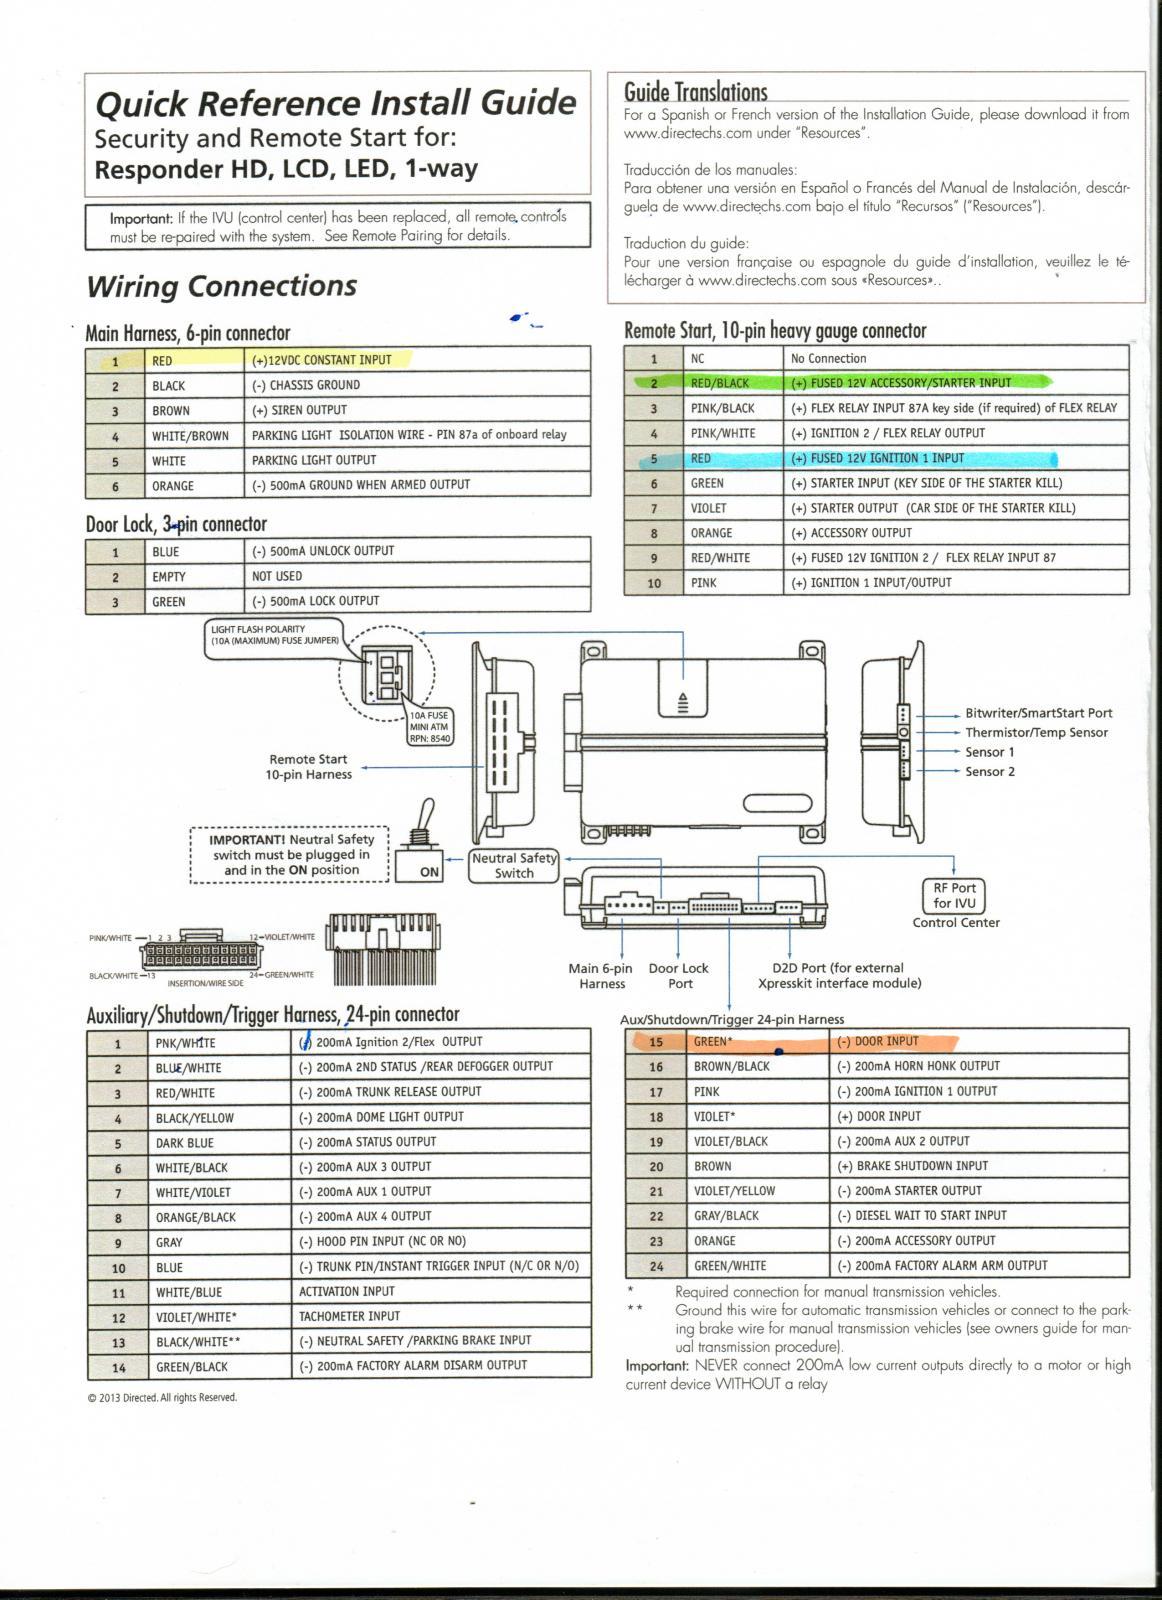 dei remote start wiring diagram toyota echo radio thesamba vanagon view topic viper alarm